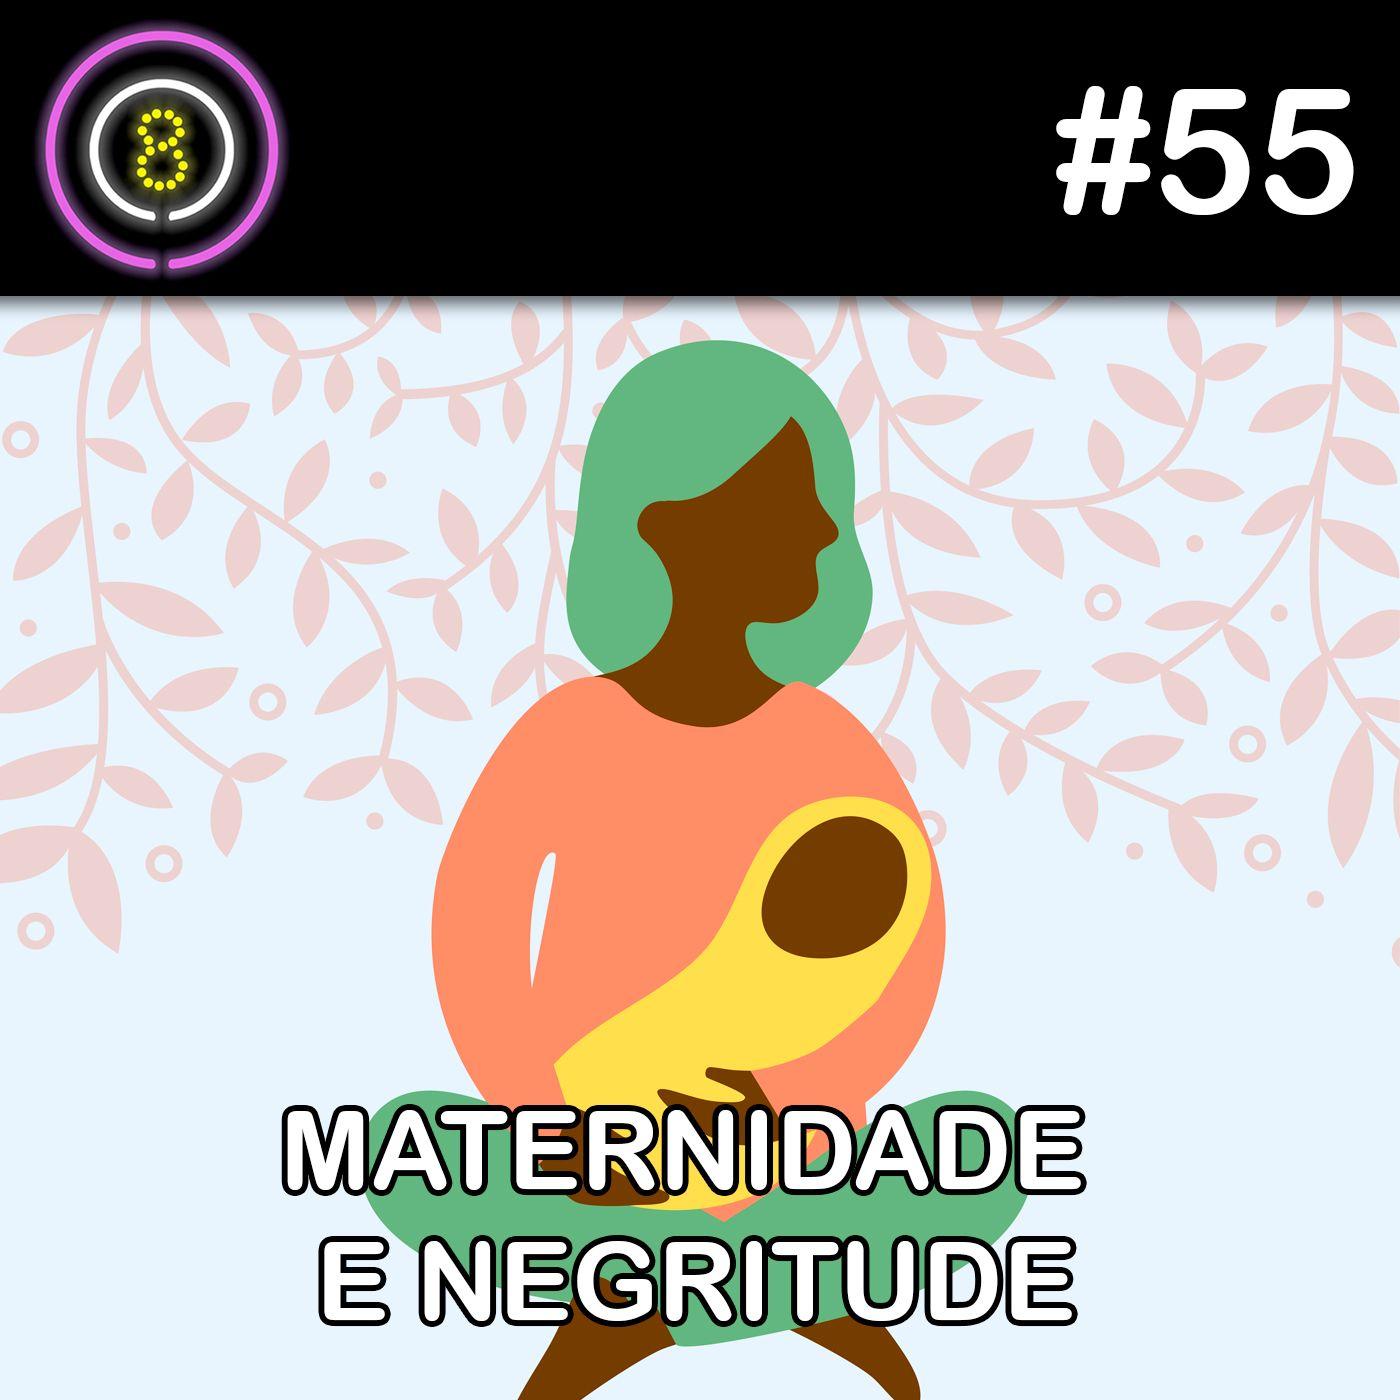 #55 - Maternidade e Negritude